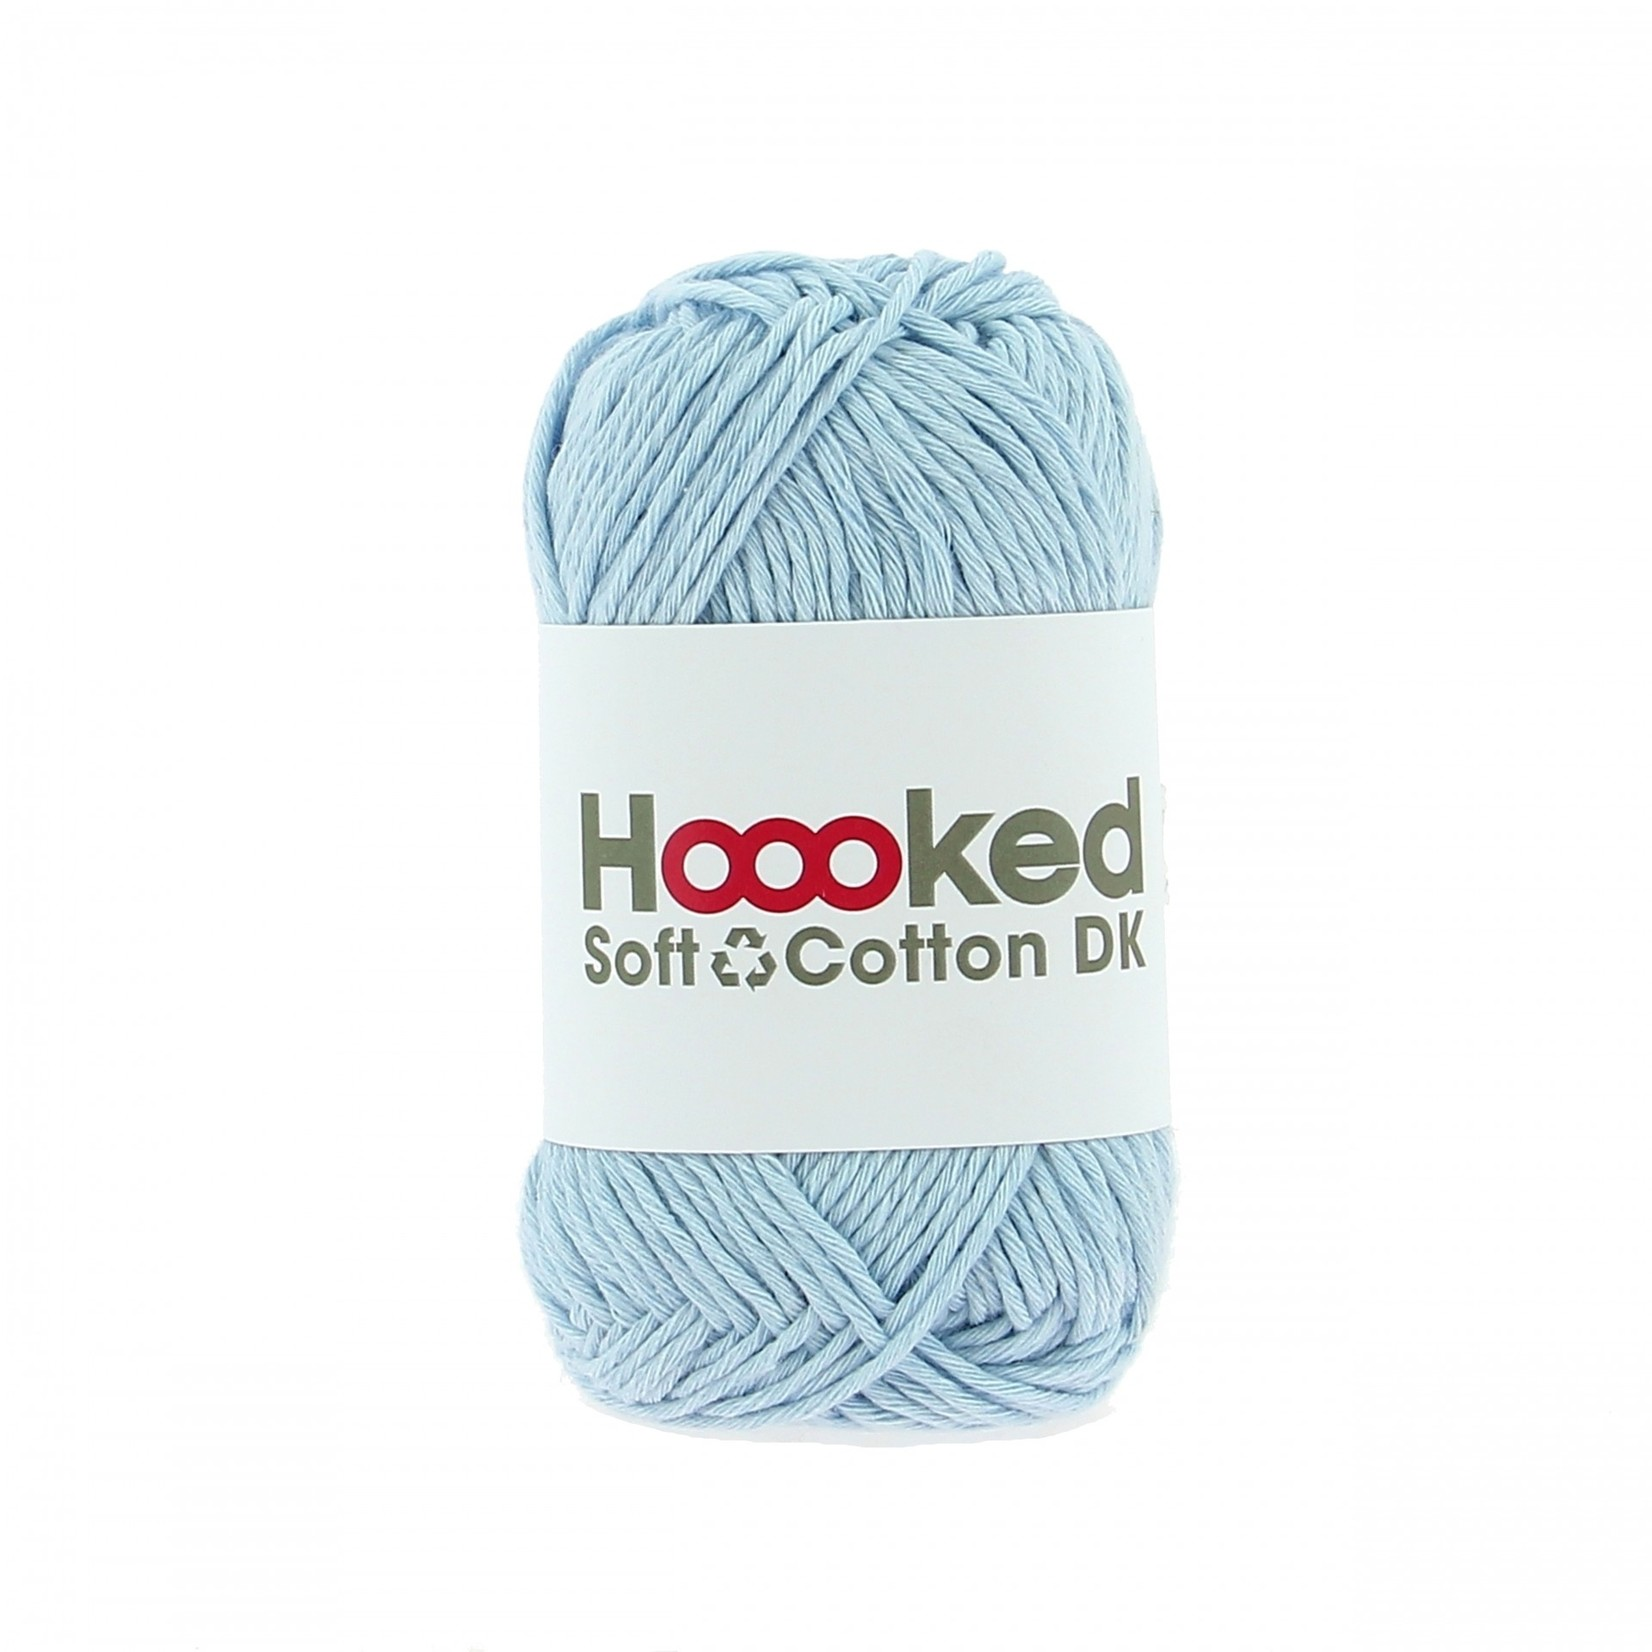 Hoooked Hoooked Soft Cotton DK Dublin Blue 50 gr. / 85 m.